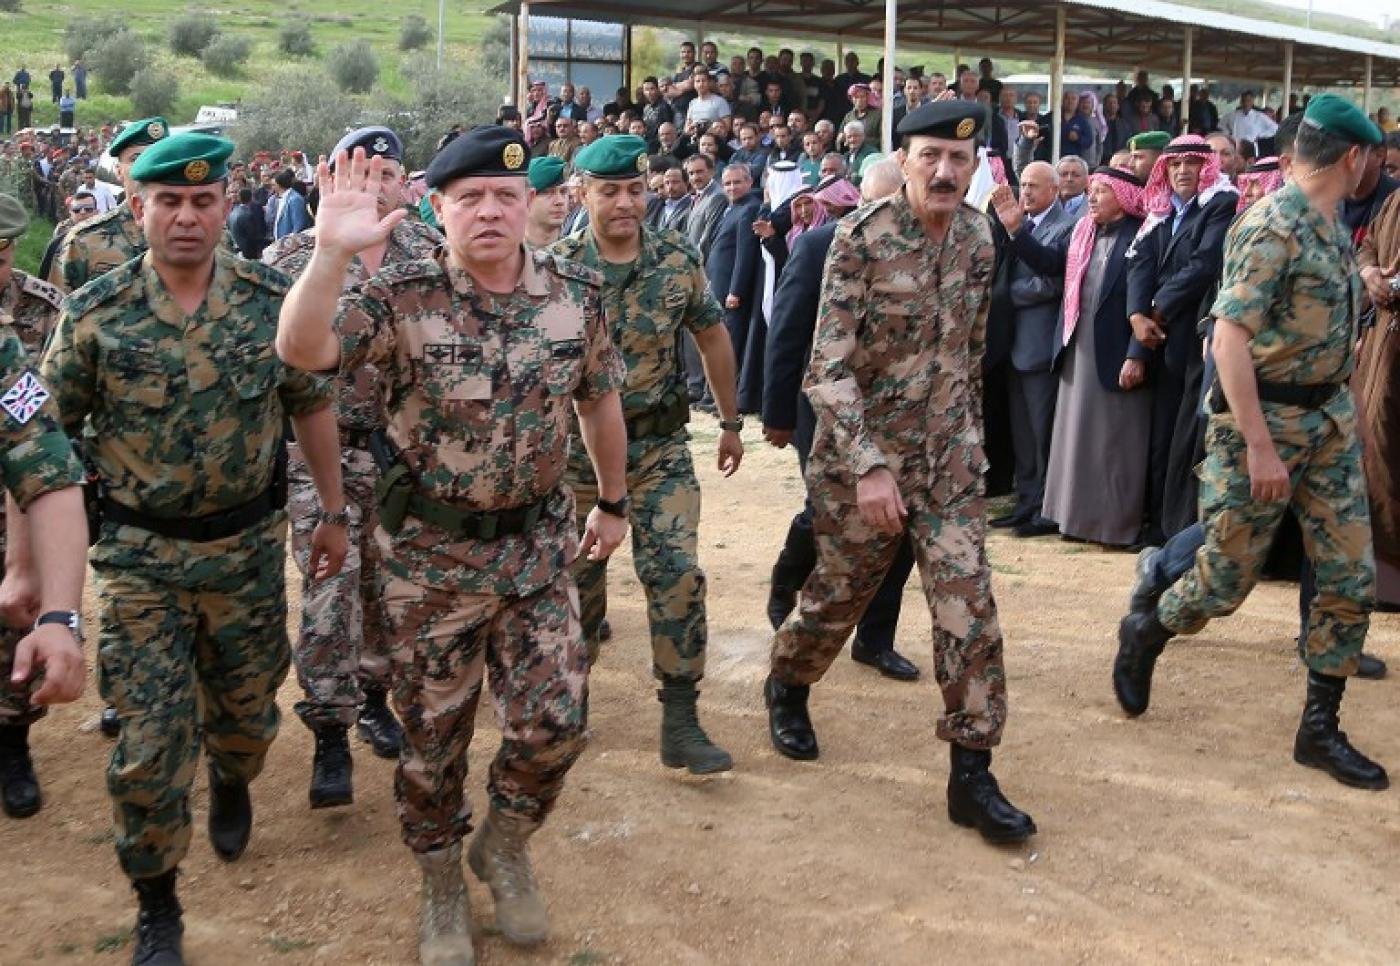 REVEALED: UK and Jordanian special forces target al-Shabab in